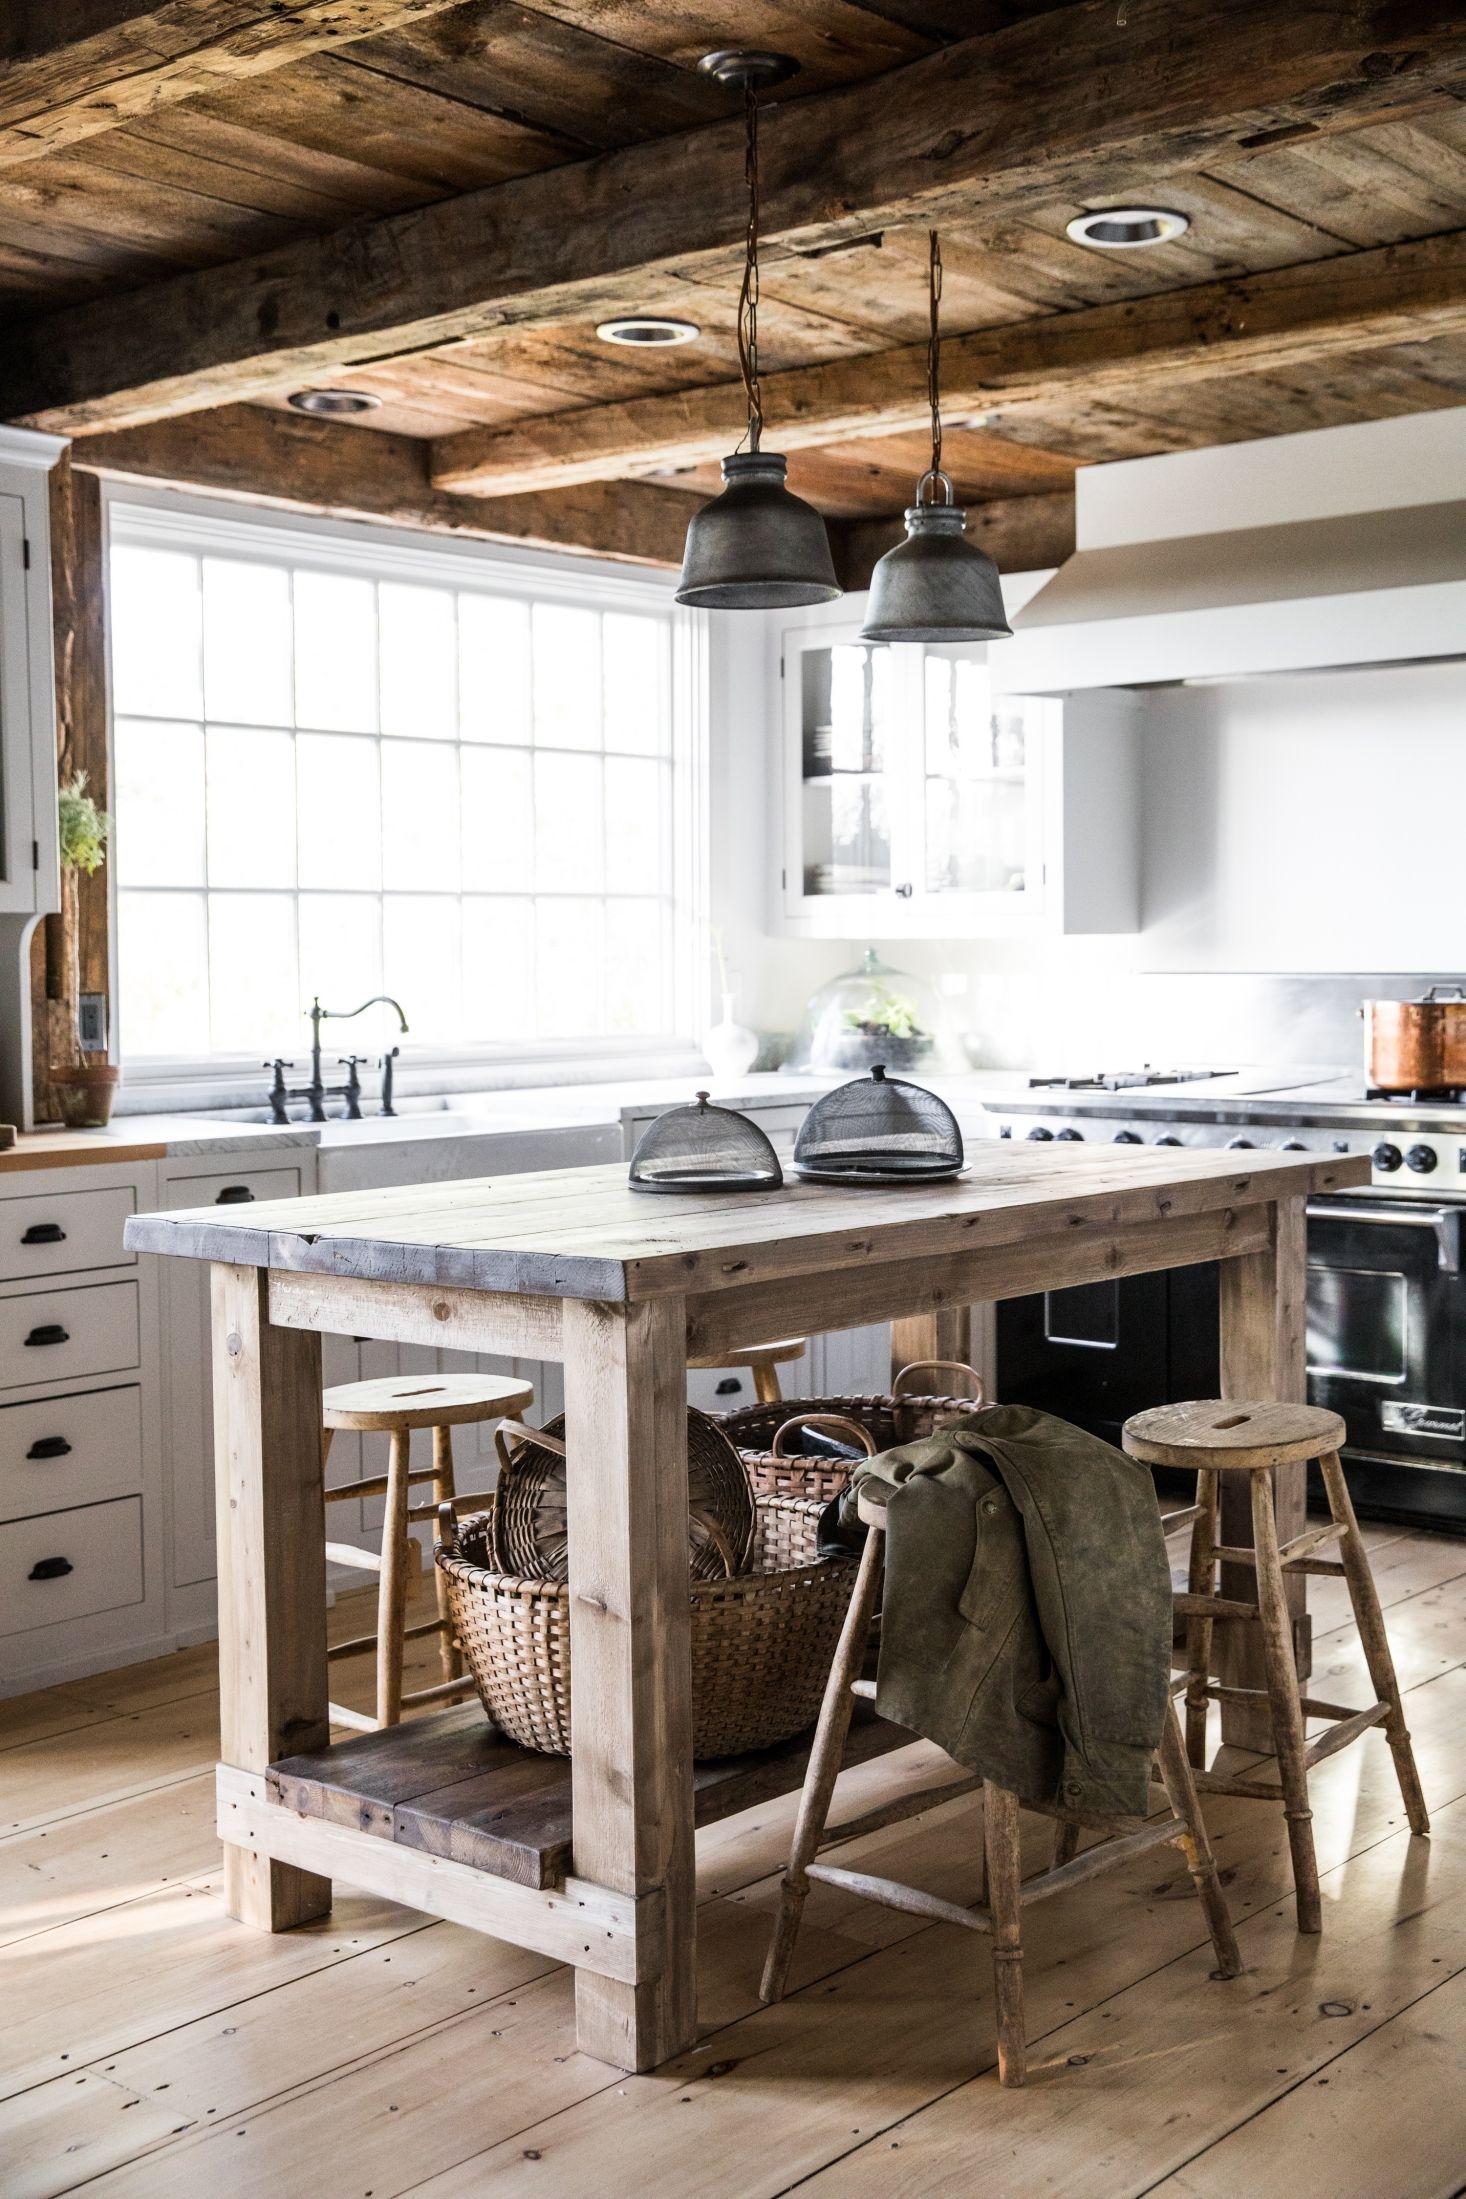 Sliding window over kitchen sink  step inside a farmhouse kitchen in maine with modern upgrades  casa